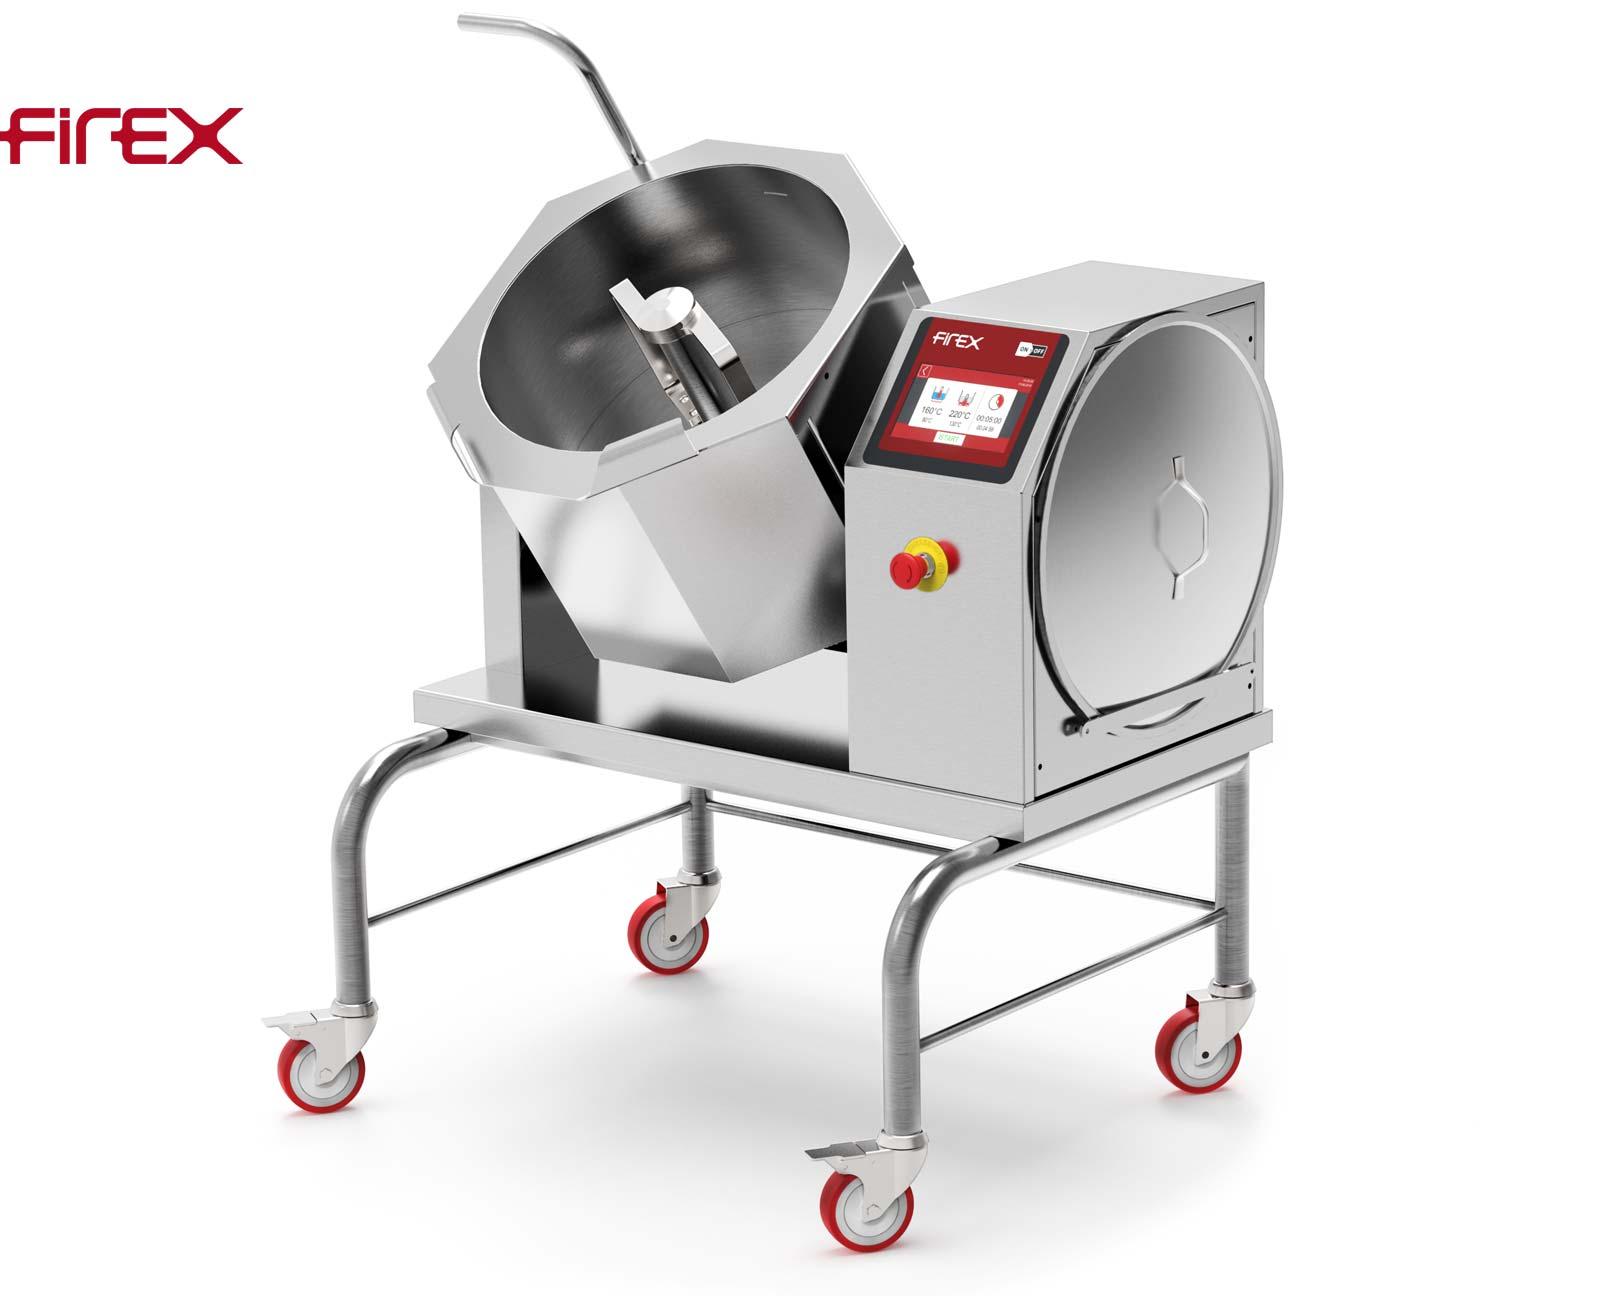 Firex Cucimix CBTE030 30 Liter - mobile Kippbratpfannen-Kochkessel-Kombination mit Rührwerk